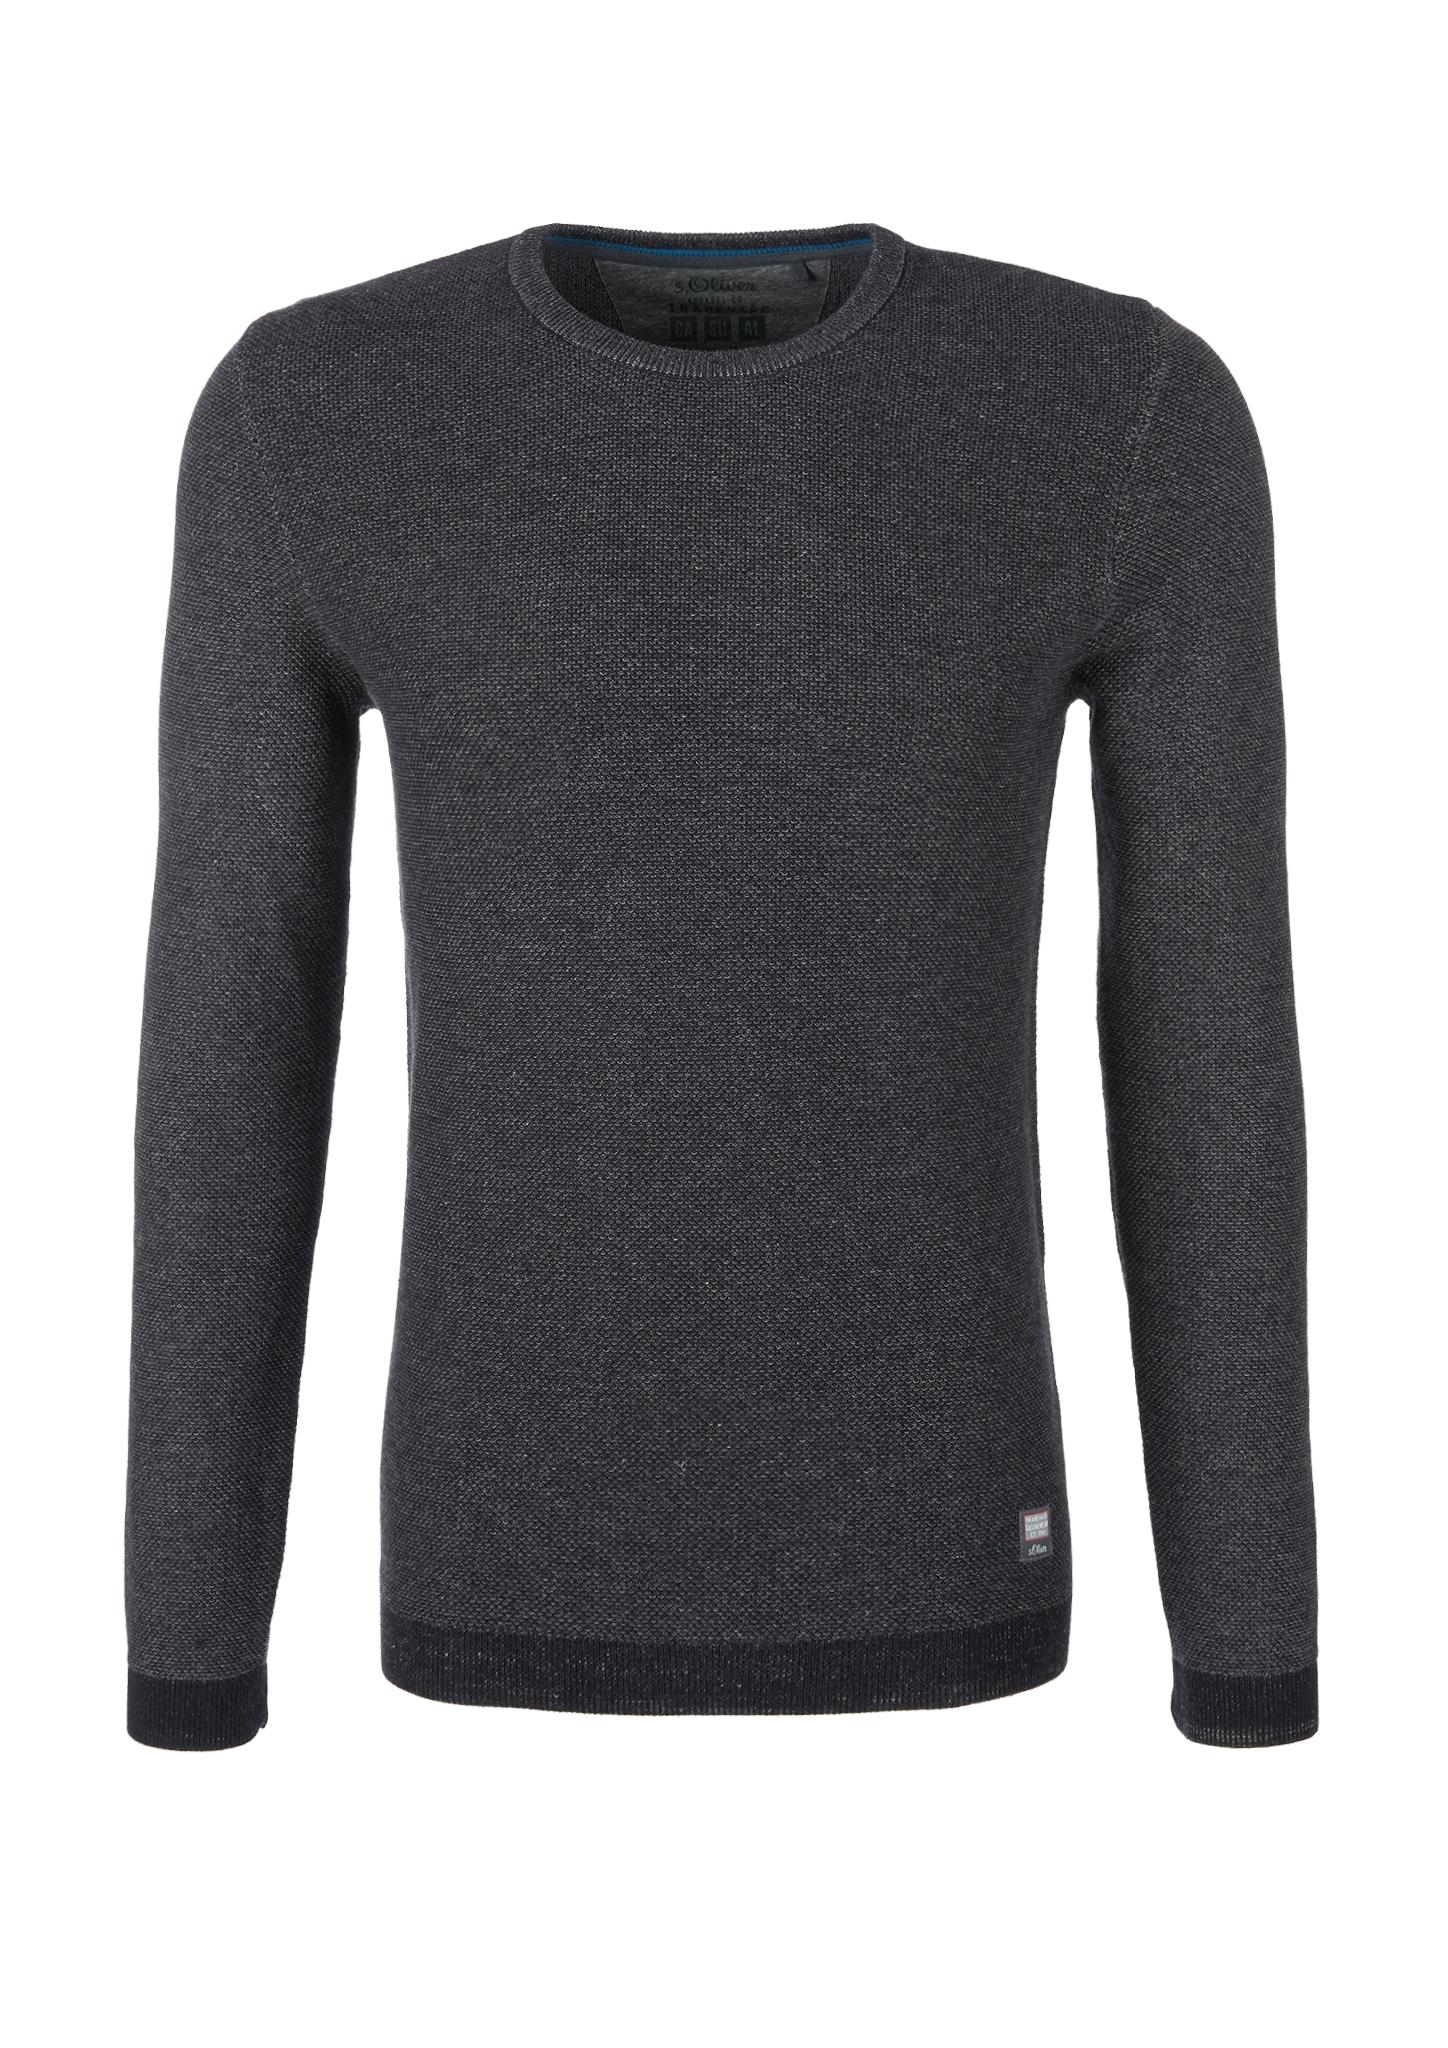 Strickpullover | Bekleidung > Pullover > Sonstige Pullover | Schwarz | 100% baumwolle | s.Oliver